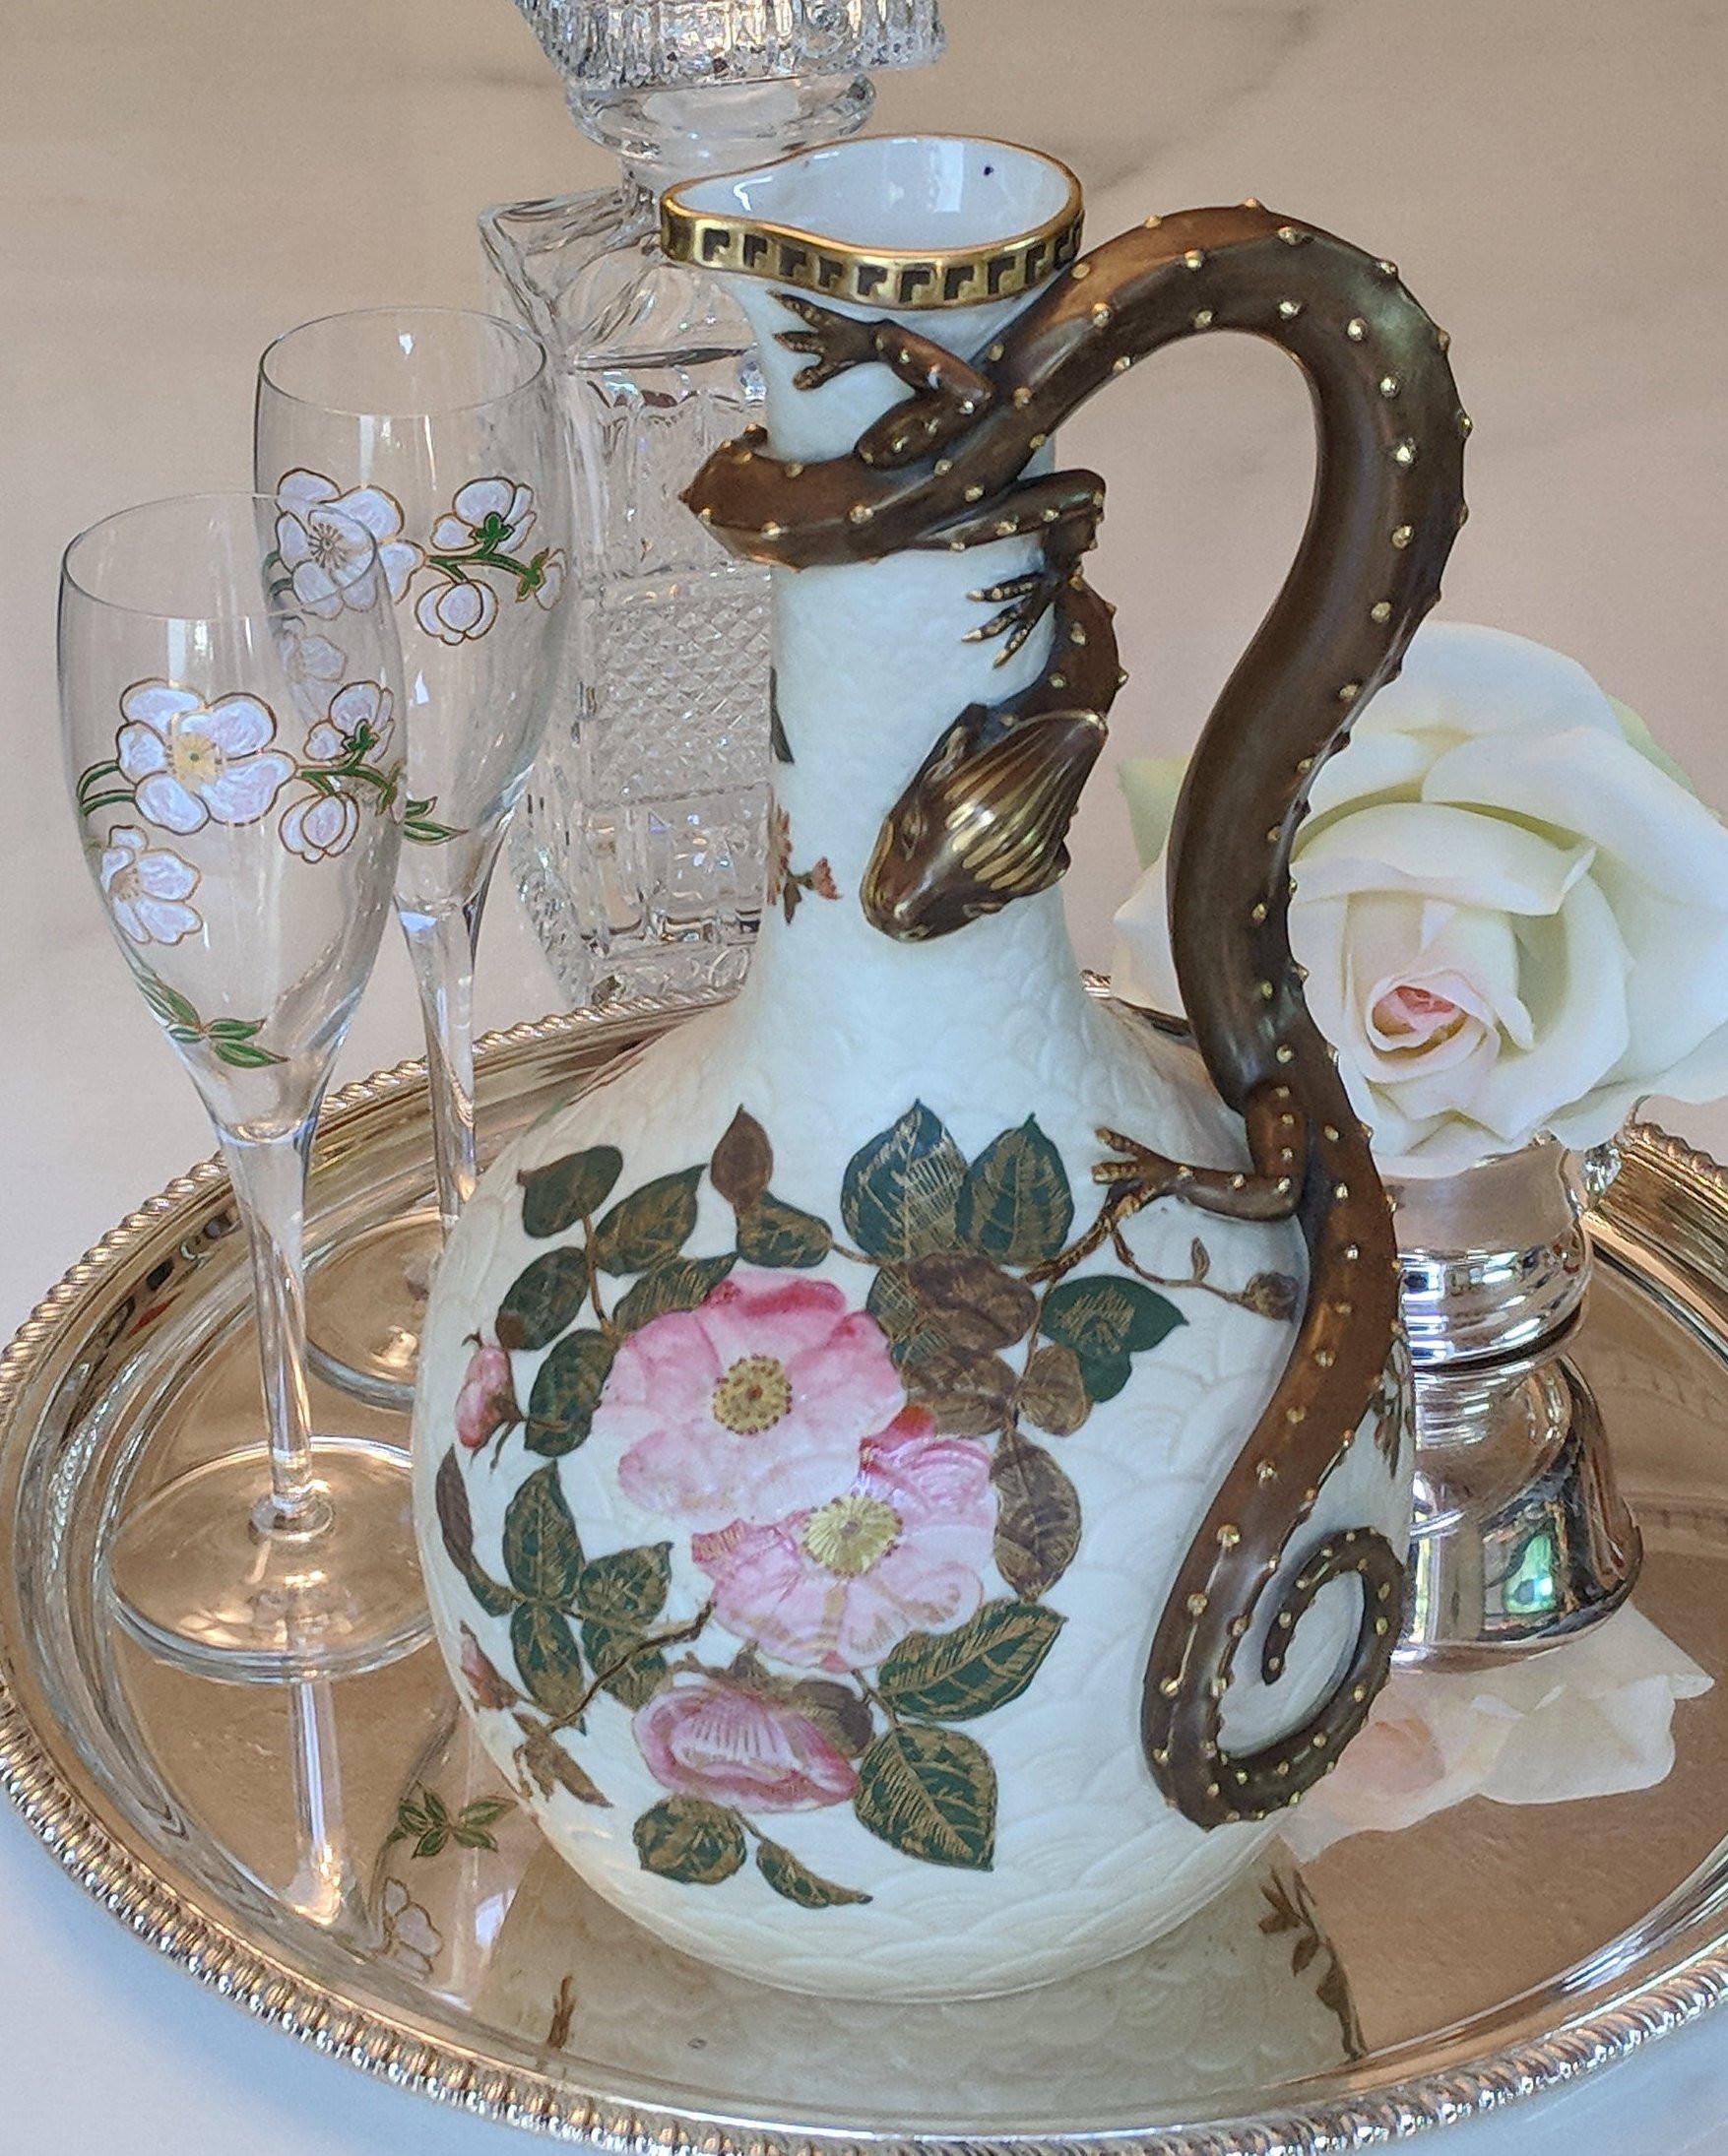 belleek china vase of antique royal worcester blush ivory porcelain ewer centrepiece etsy in dc29fc294c28epowiac299ksz